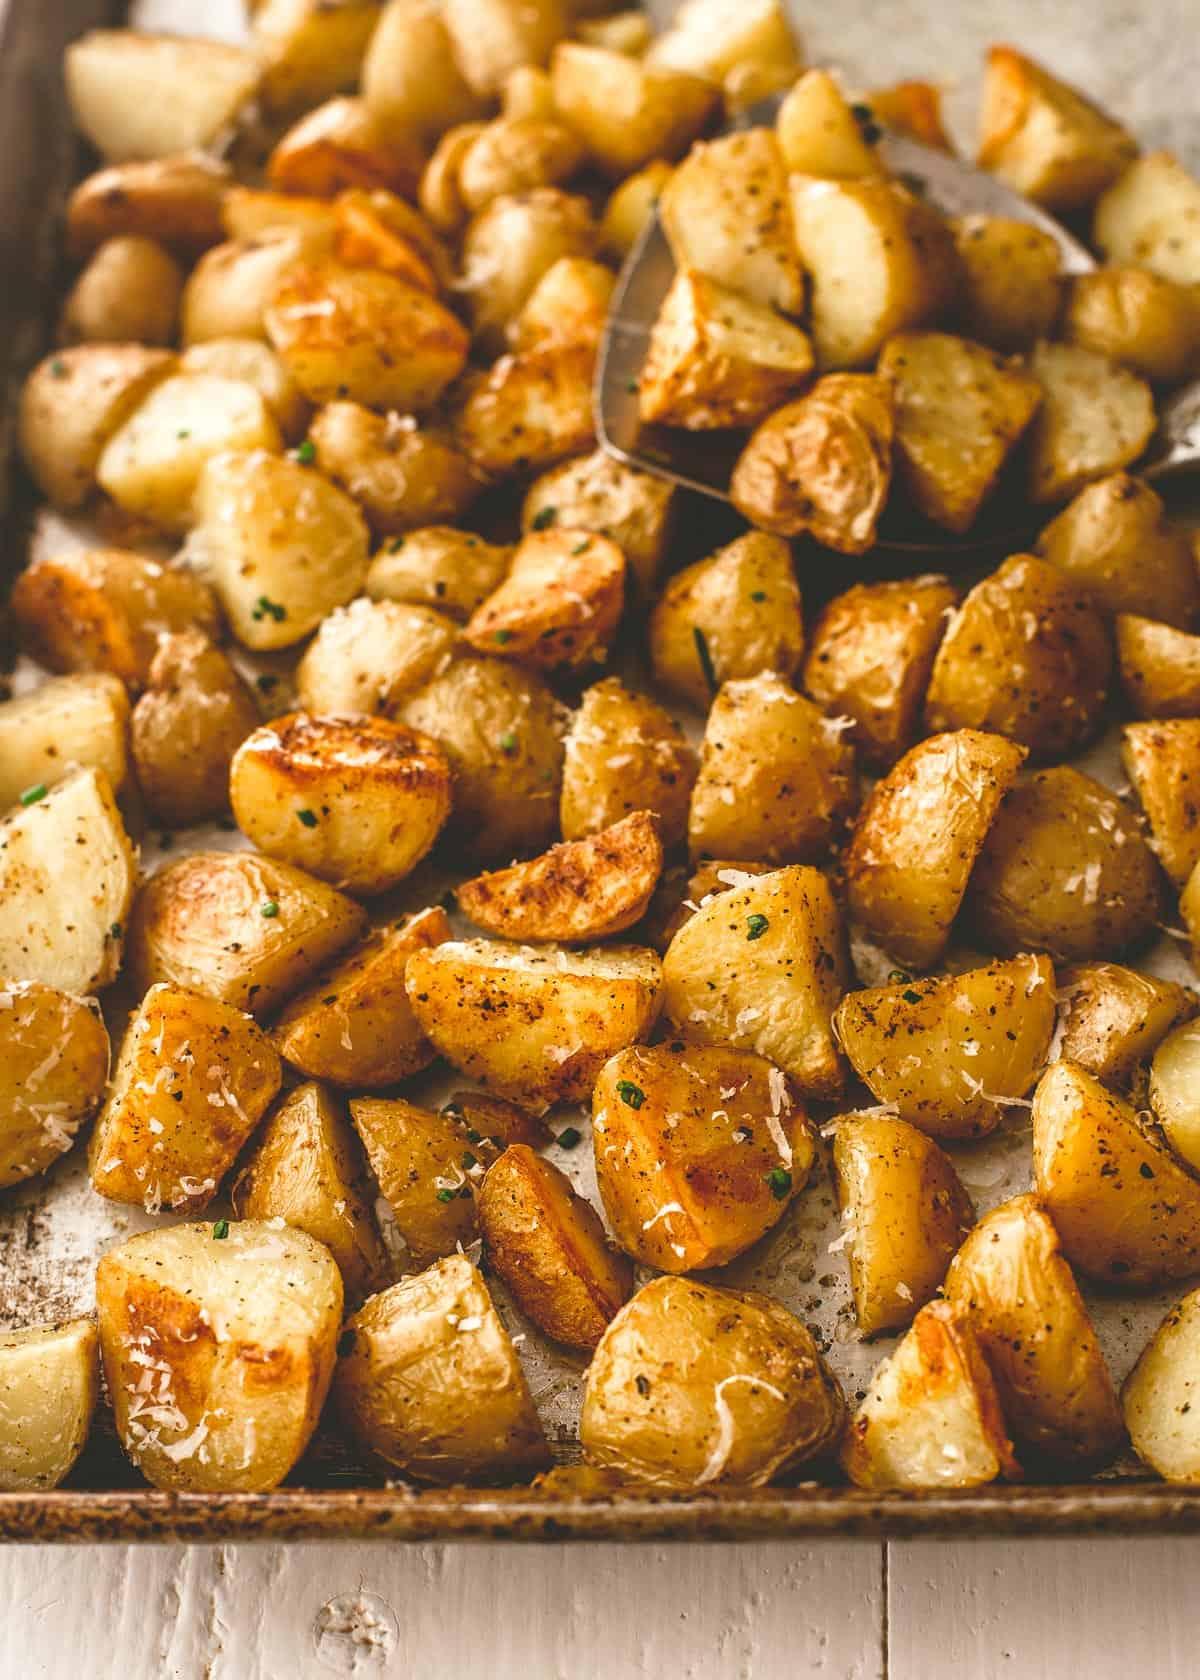 roasted potatoes on a sheet pan